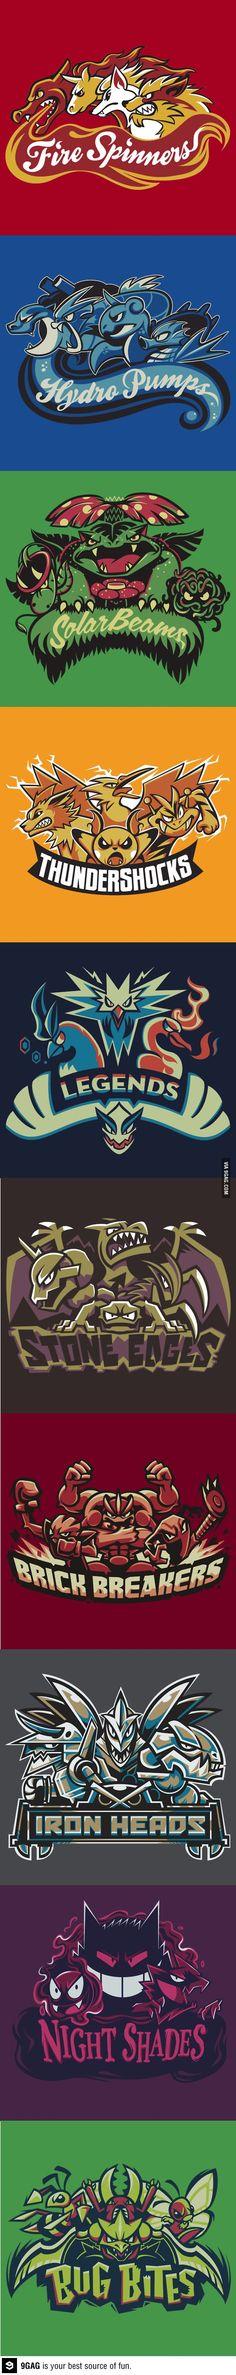 Team Pokemon!